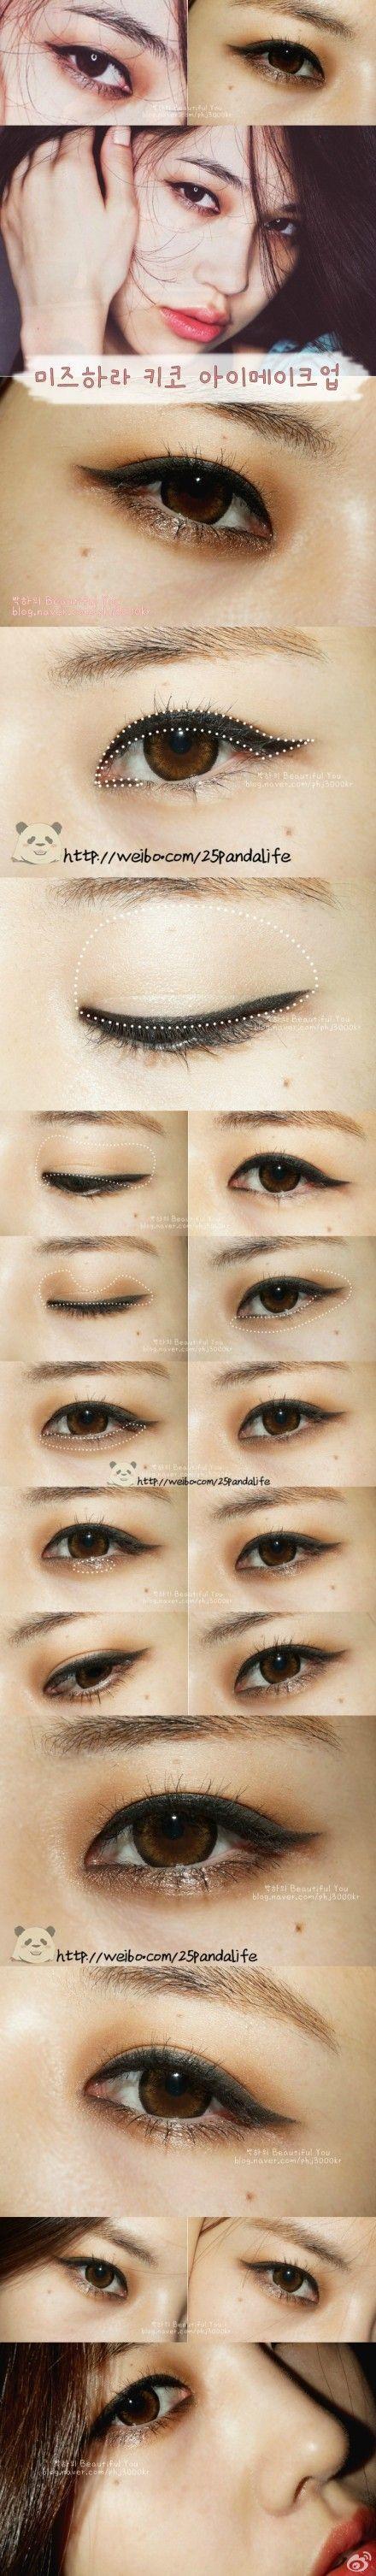 Korean make up makeup inspiration pinterest korean makeup korean makeup tutorial feminine hanbok makeup by heizle korean makeup baditri Image collections